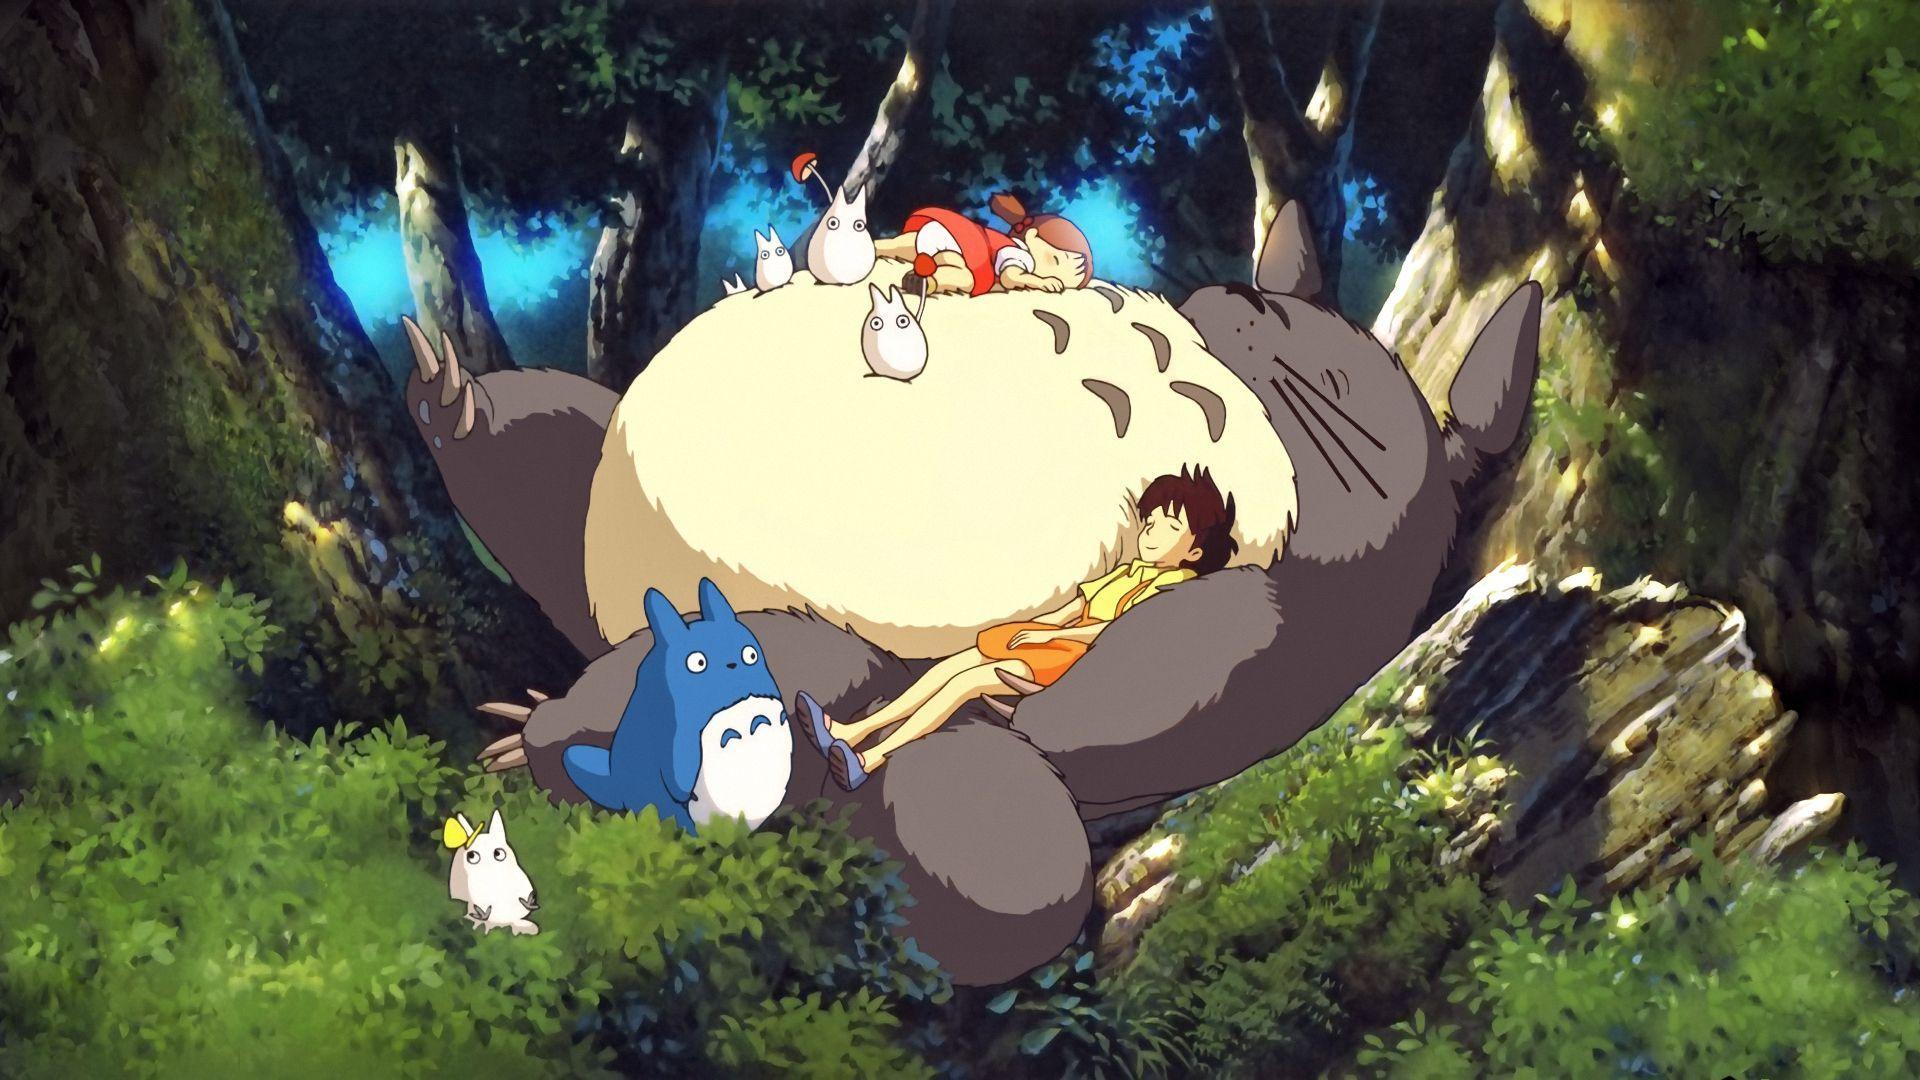 Totoro Wallpaper 27975 1920x1080 px HDWallSourcecom